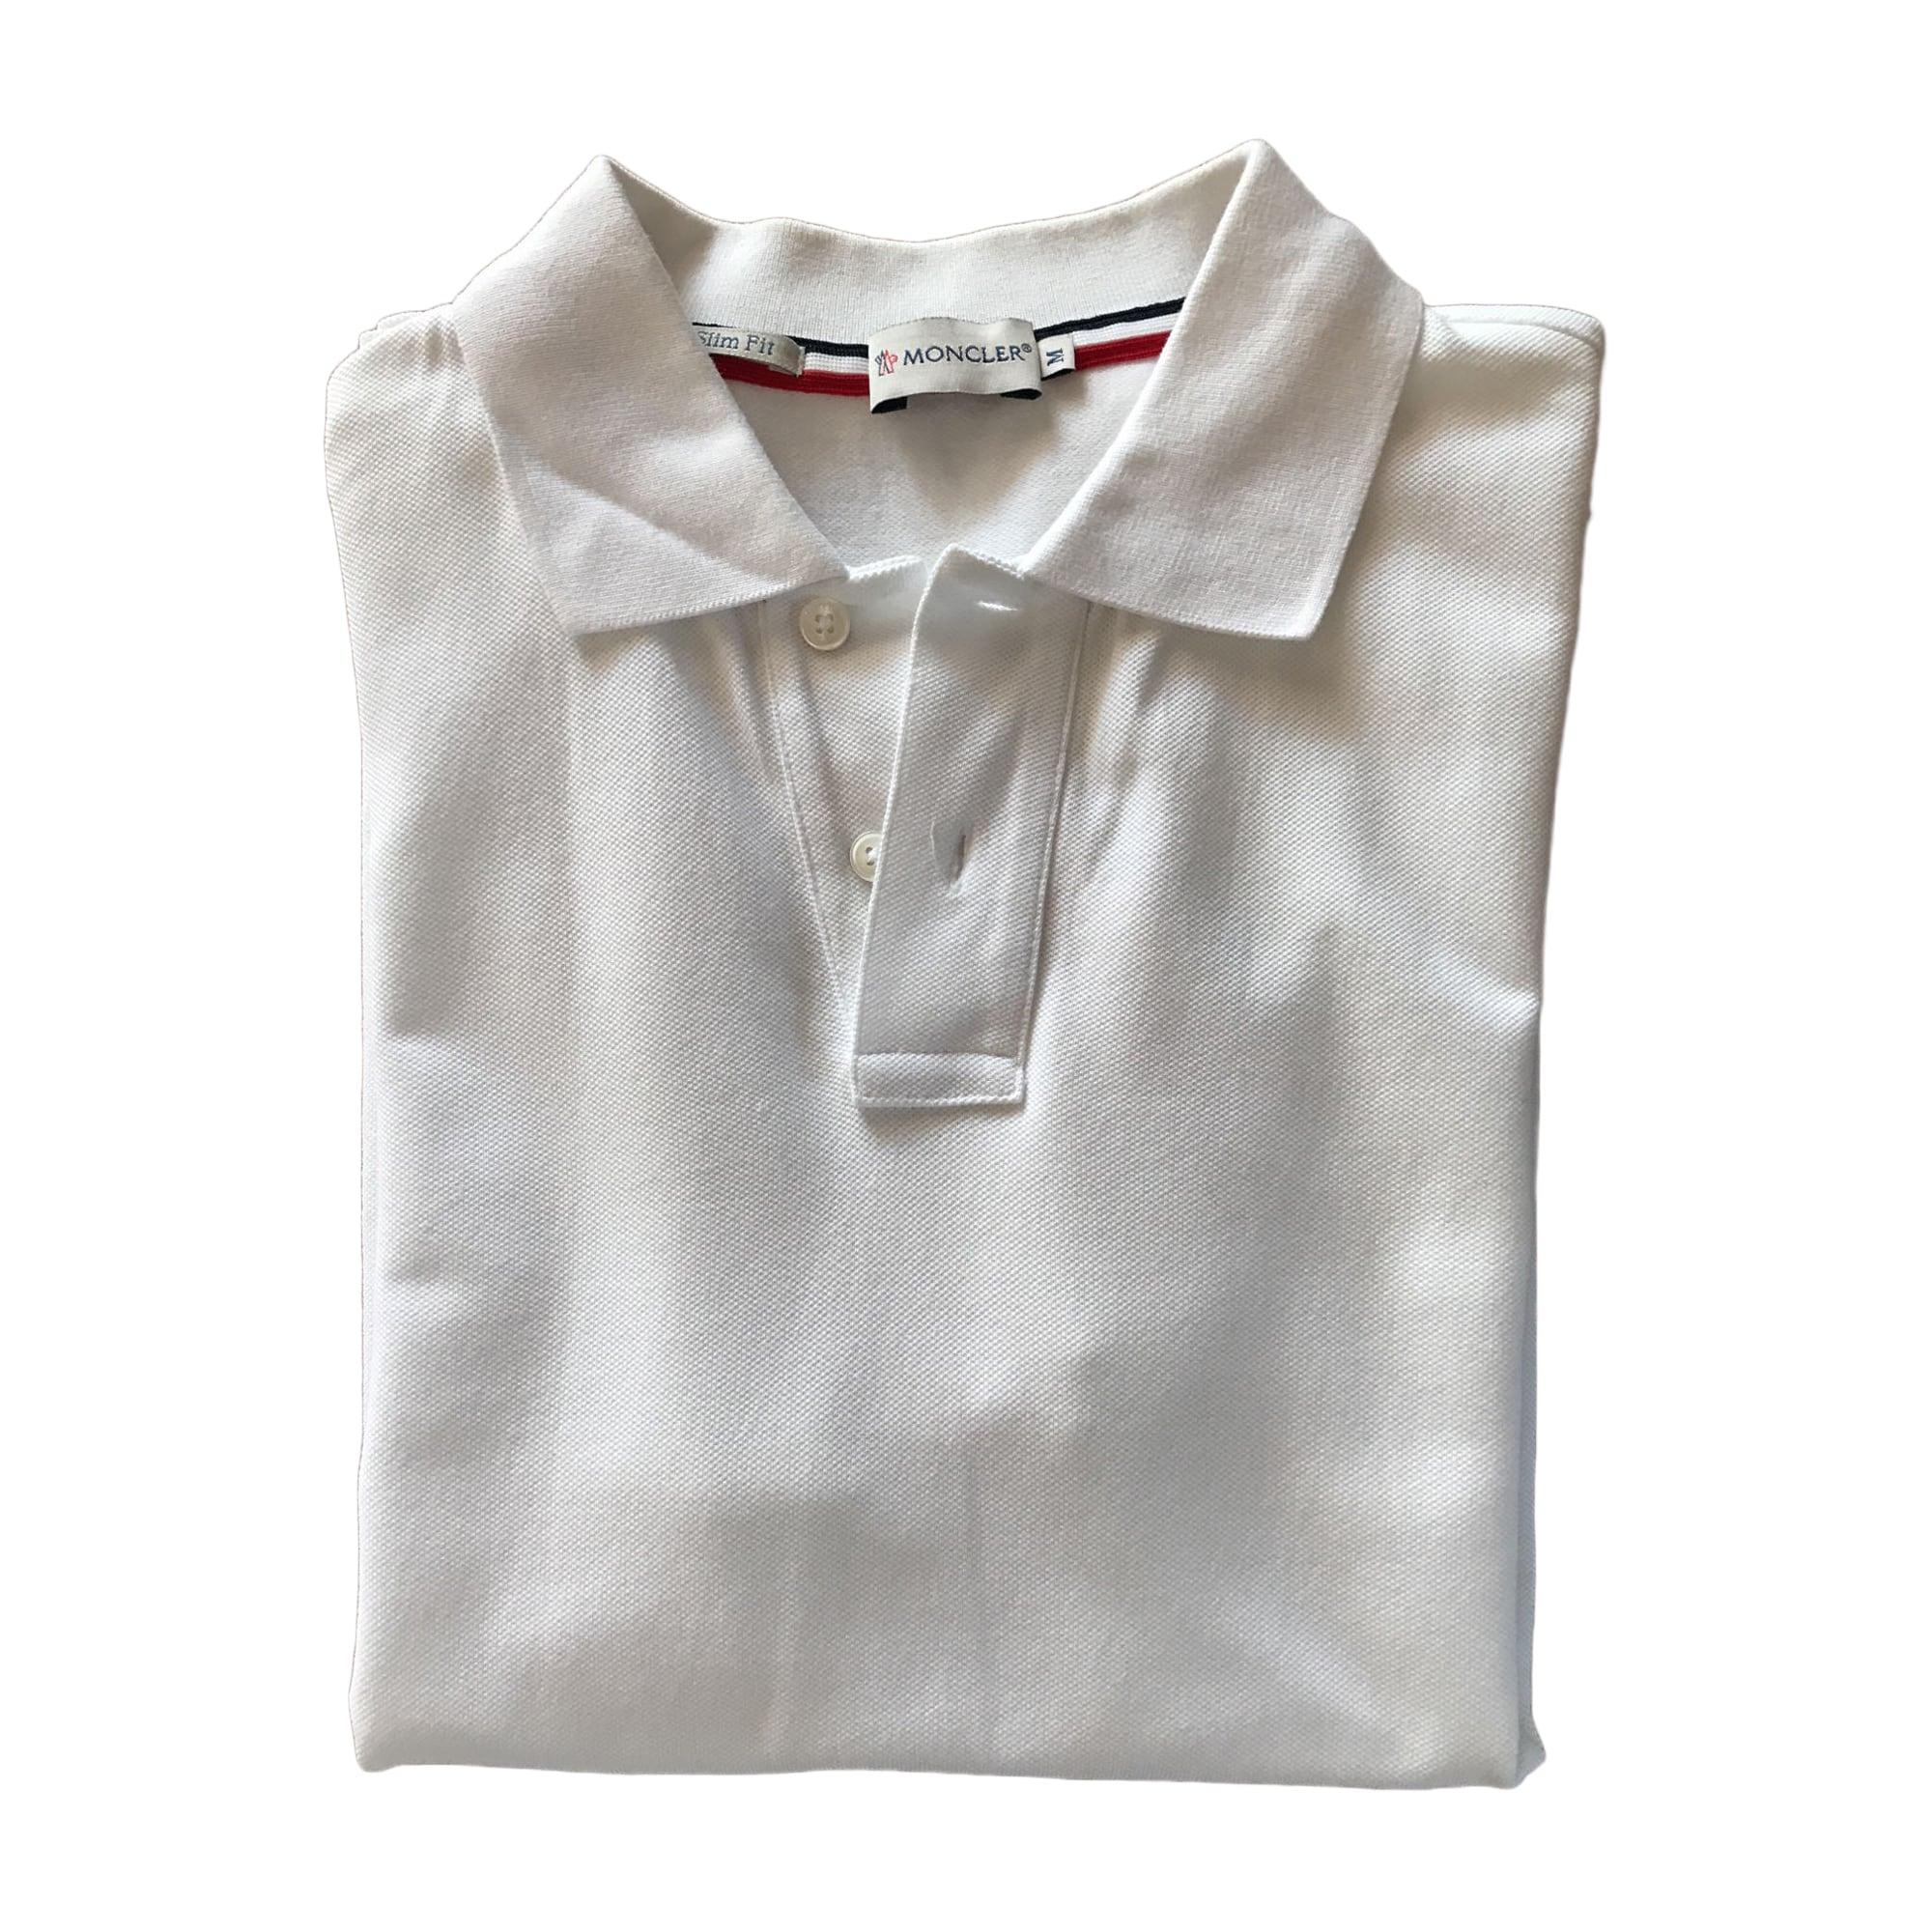 Polo MONCLER Blanc, blanc cassé, écru